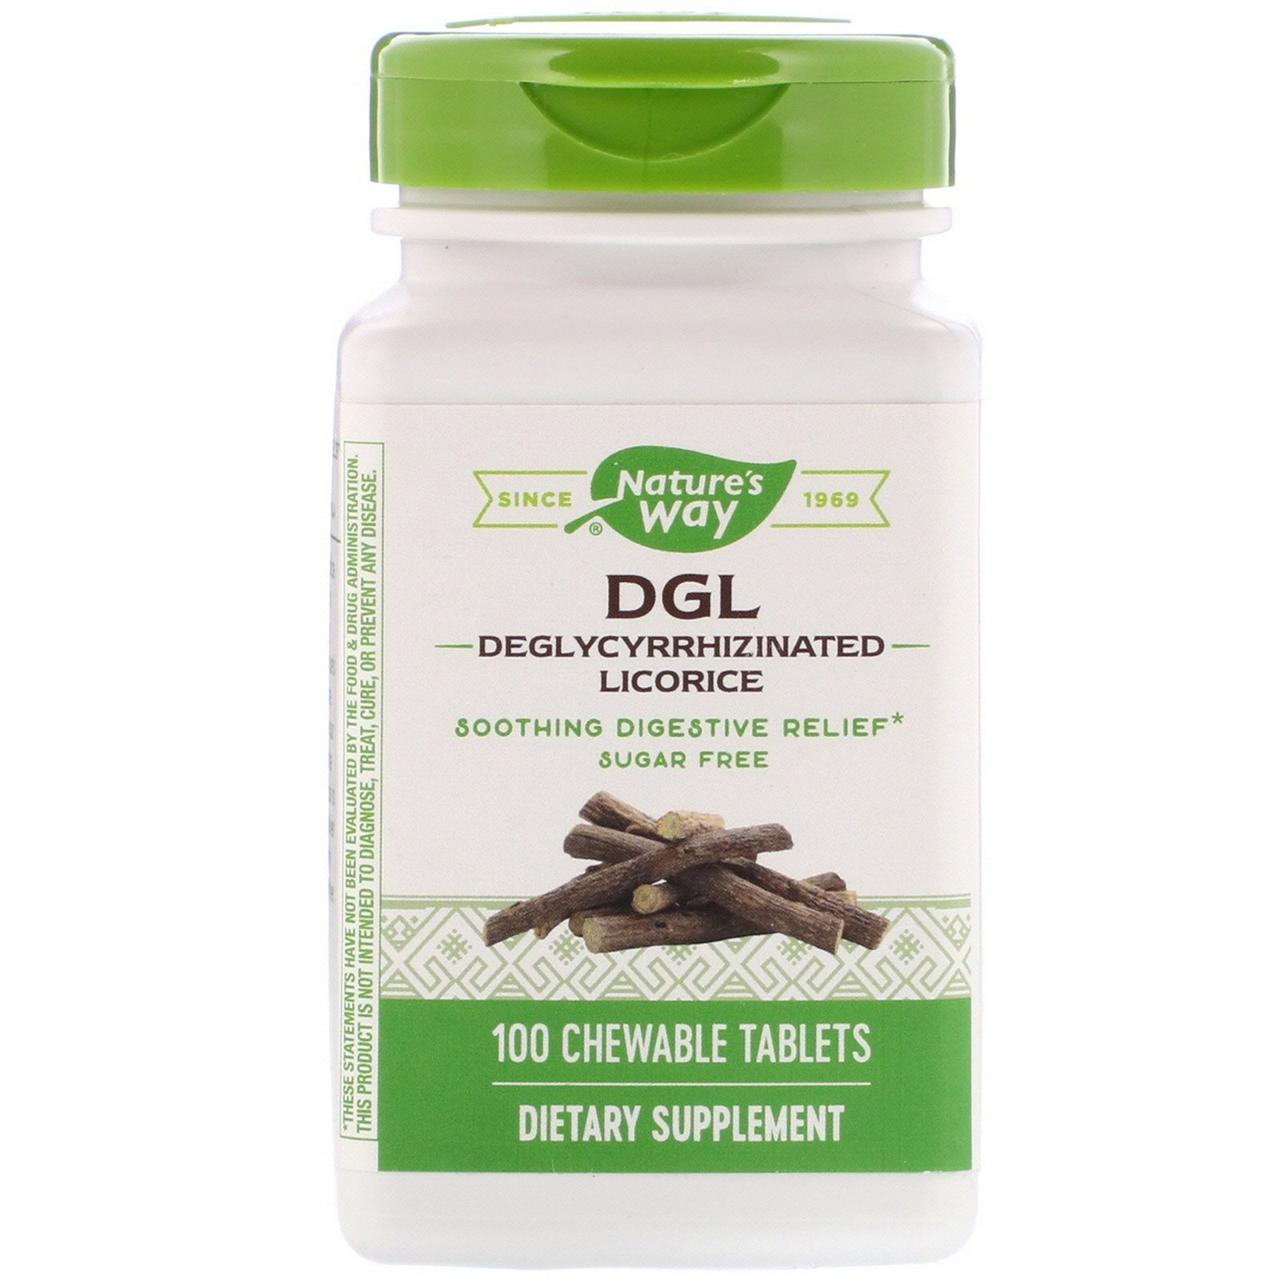 Корень солодки (DGL, Deglycyrrhizinated Licorice), Enzymatic Therapy, 100 таблеток